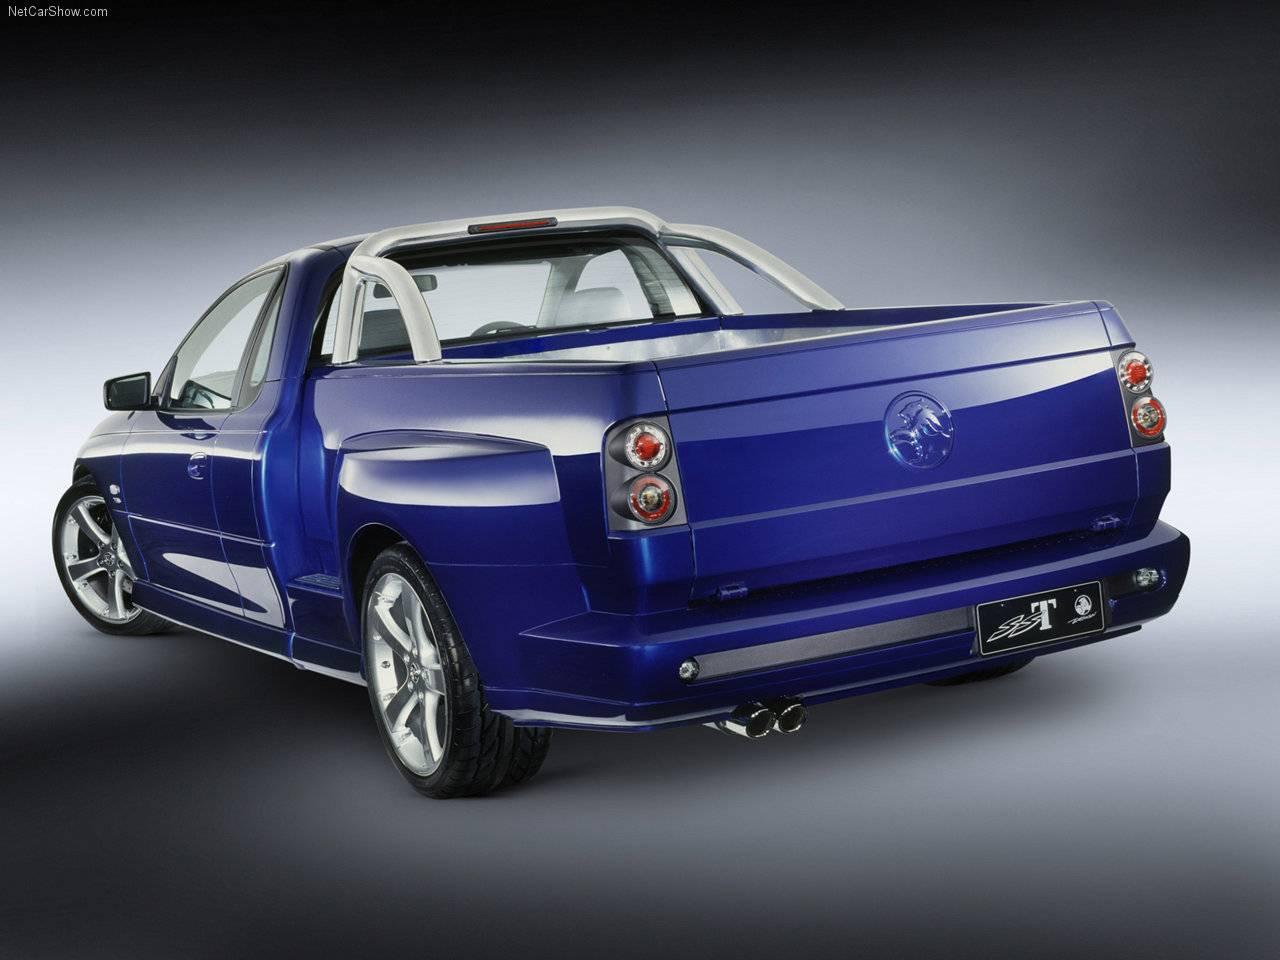 2002 Holden SST Concept